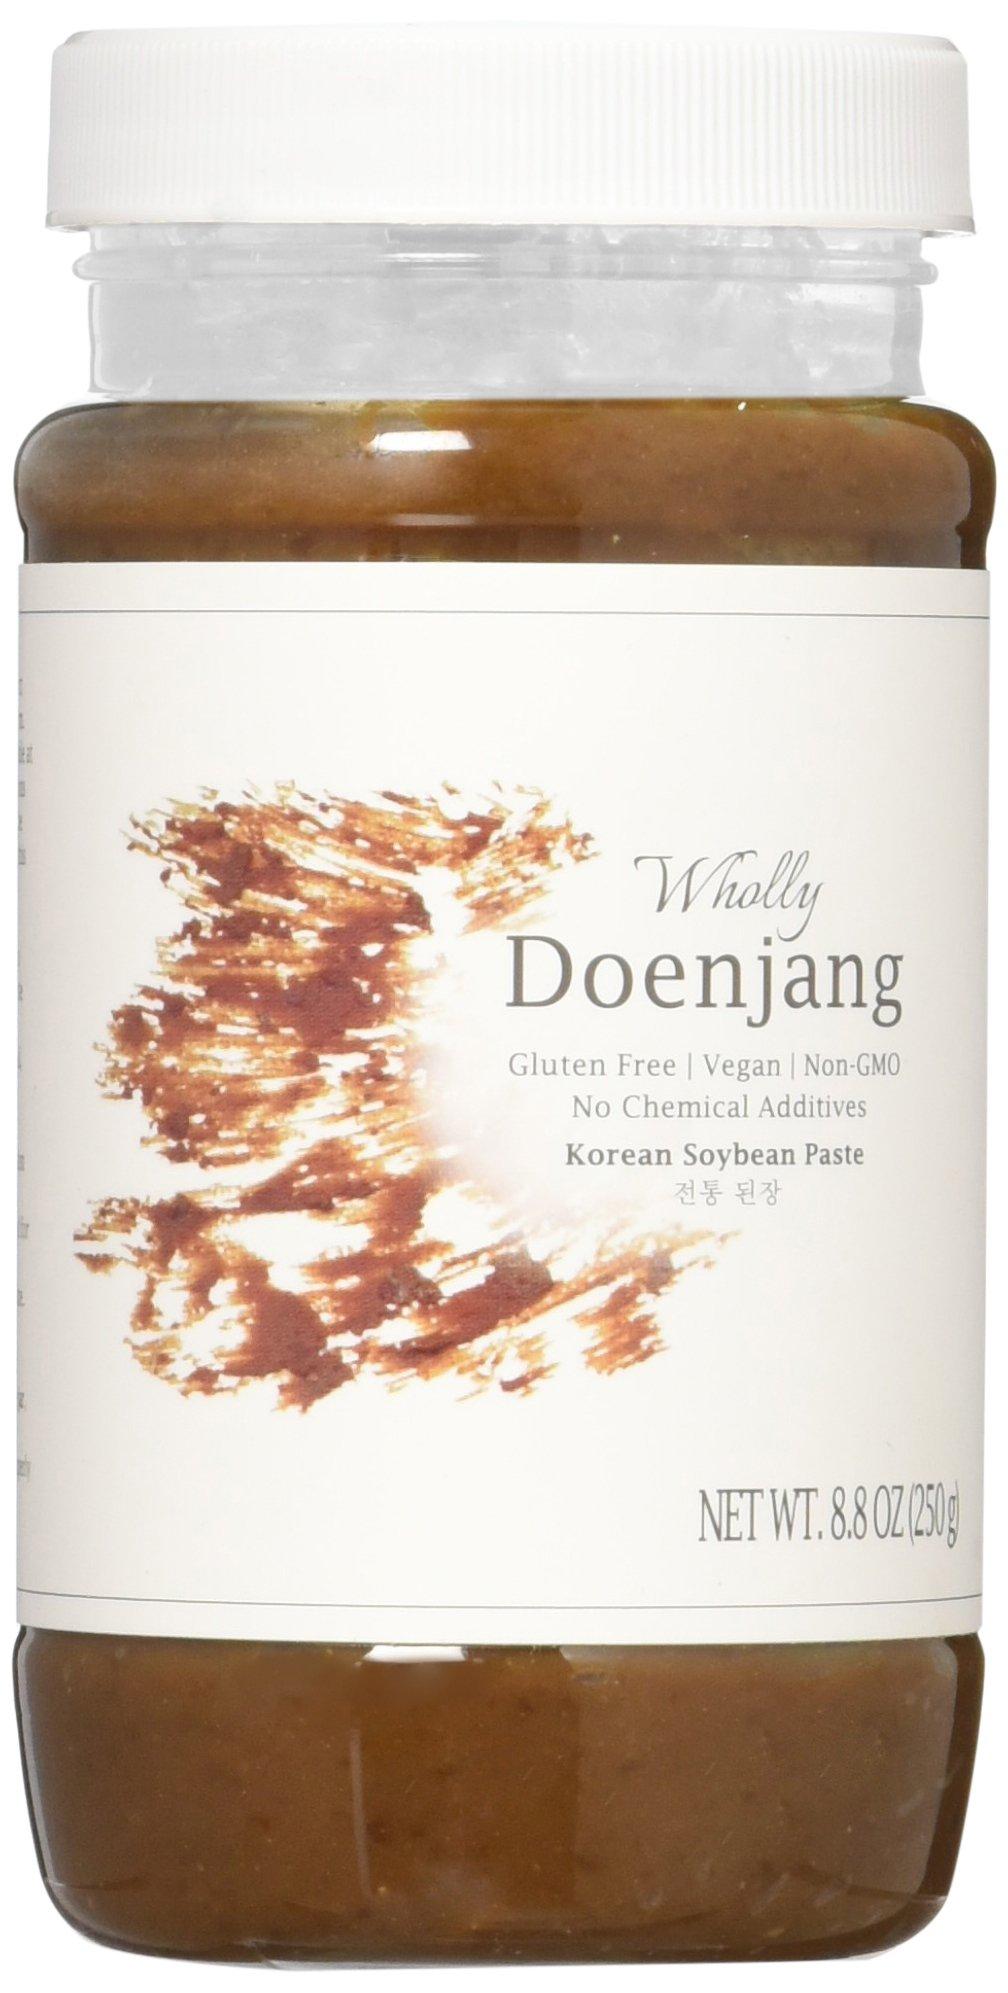 Wholly Doenjang, Premium Gluten-free Unpasteurized Artisanal 3 Year Aged Korean Soybean Paste (9 oz)